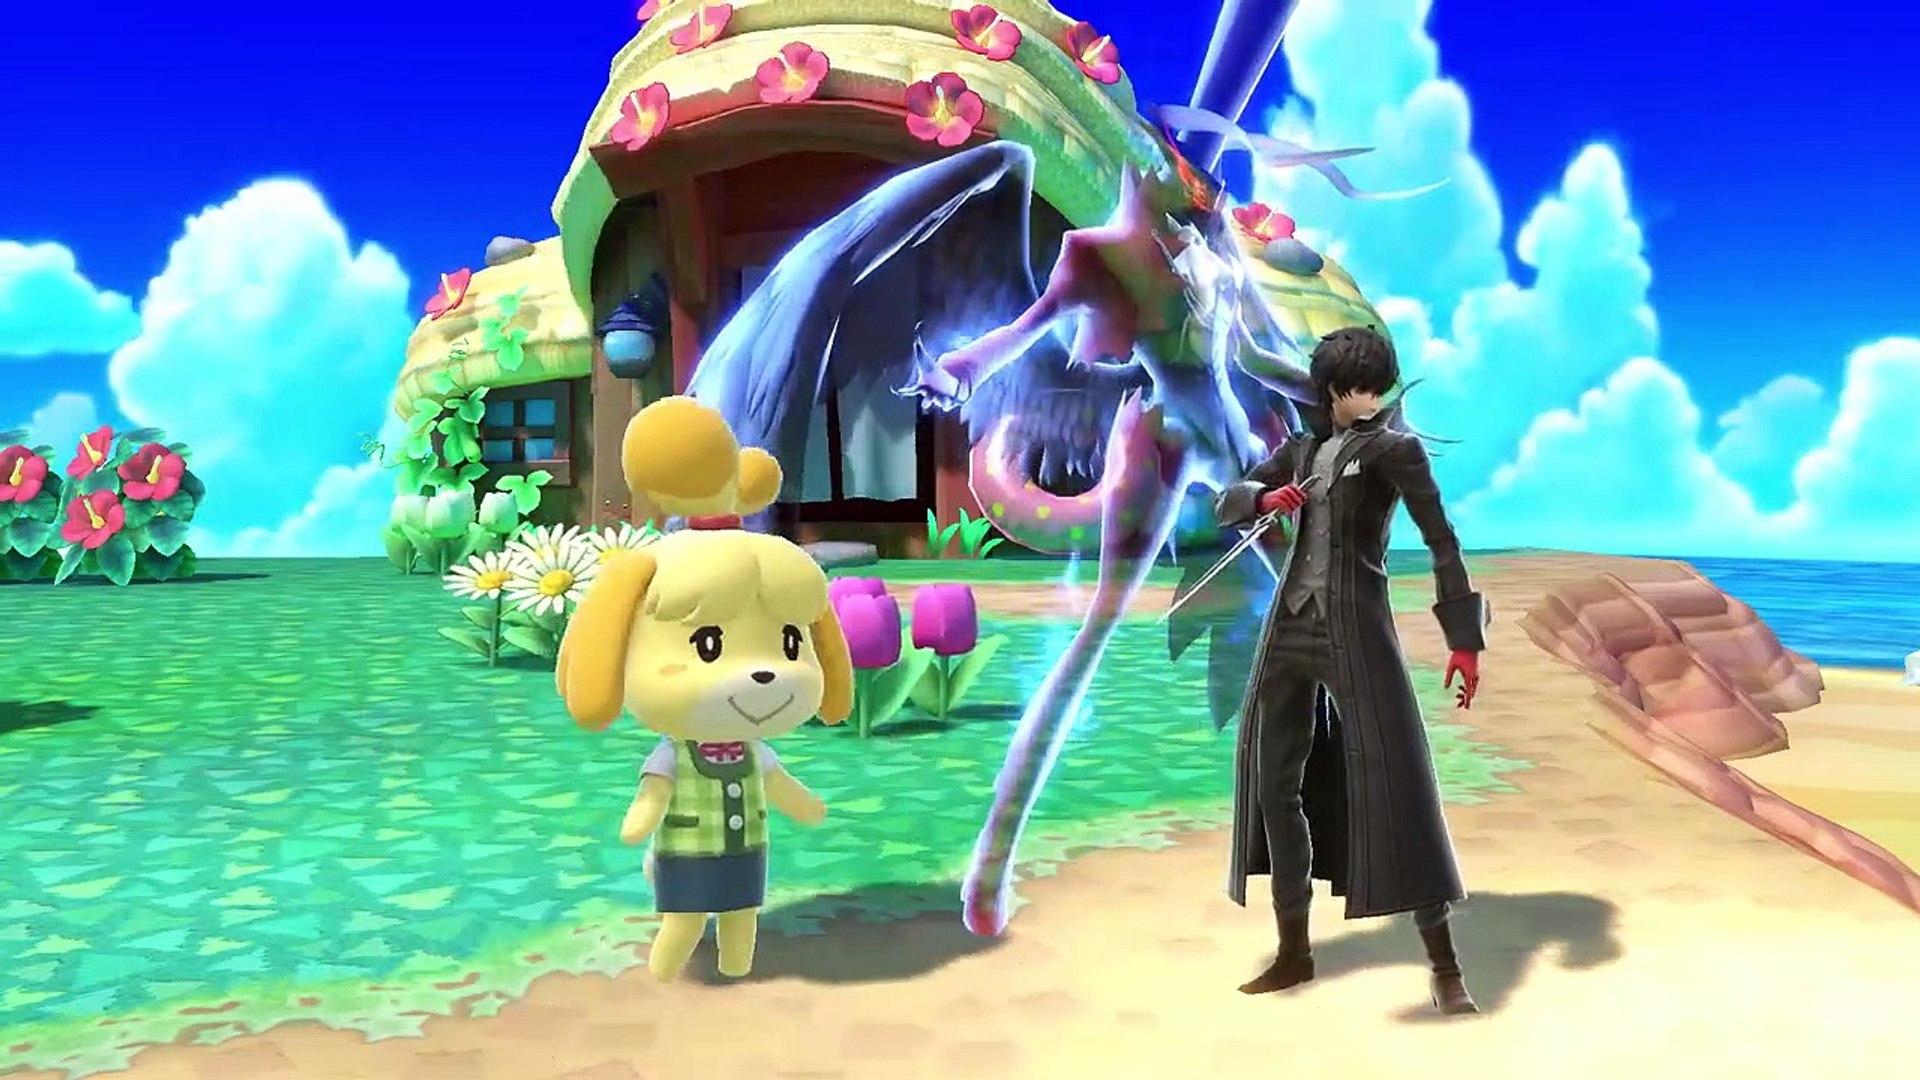 Super Smash Bros. Ultimate – ¡Se aproxima nuevo contenido! (Nintendo Switch)